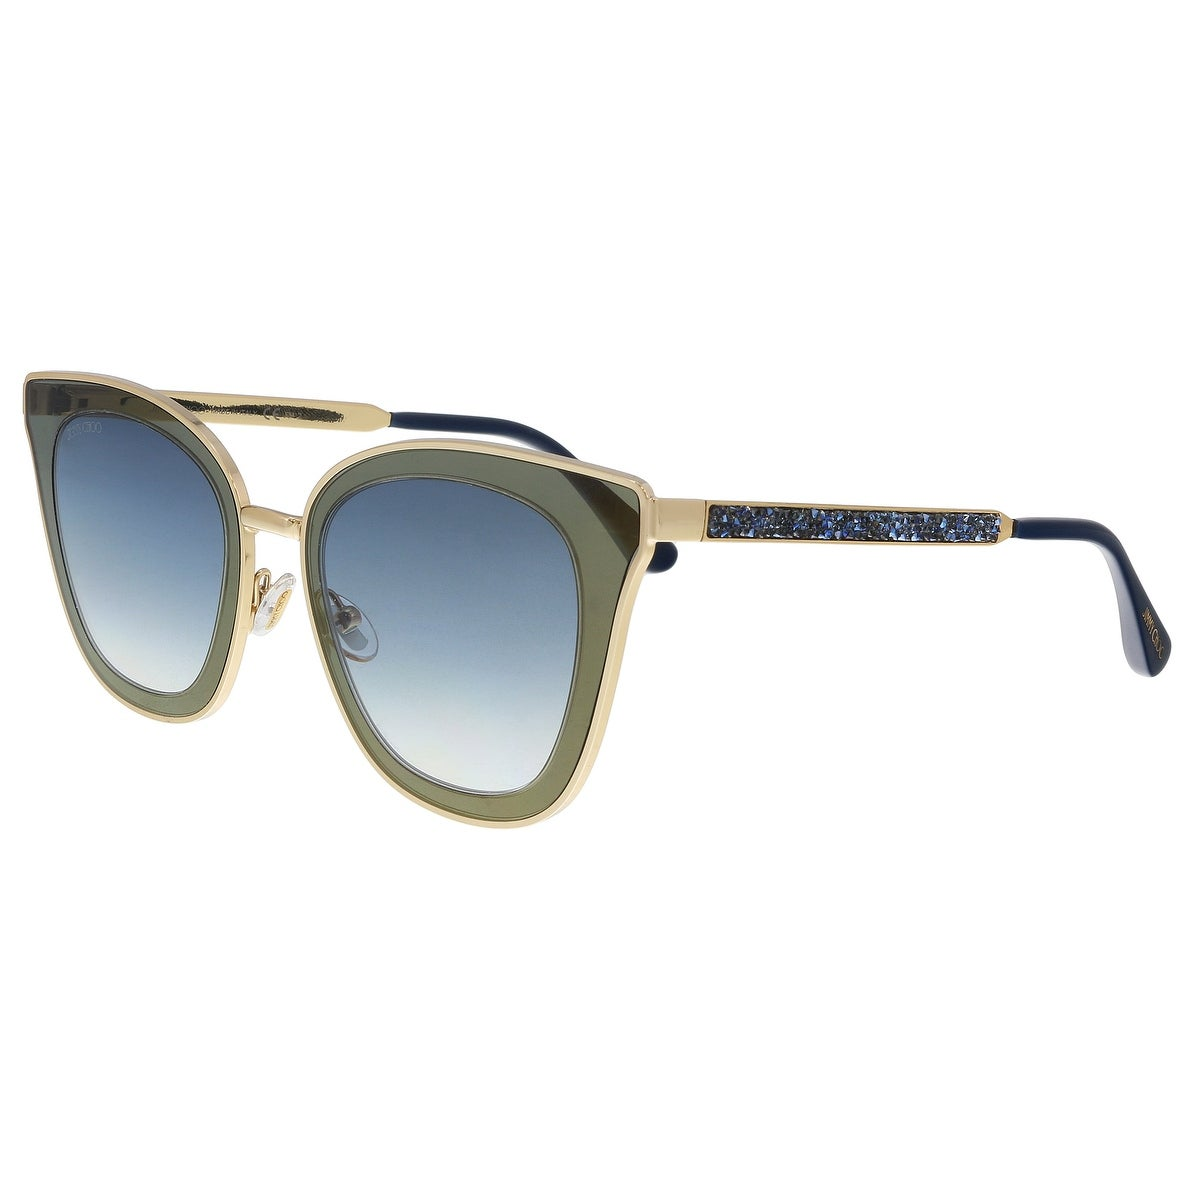 135db367e09d Shop Jimmy Choo LORY/S 0KY2 Gold/ Blue Cat Eye Sunglasses - 49-23 ...